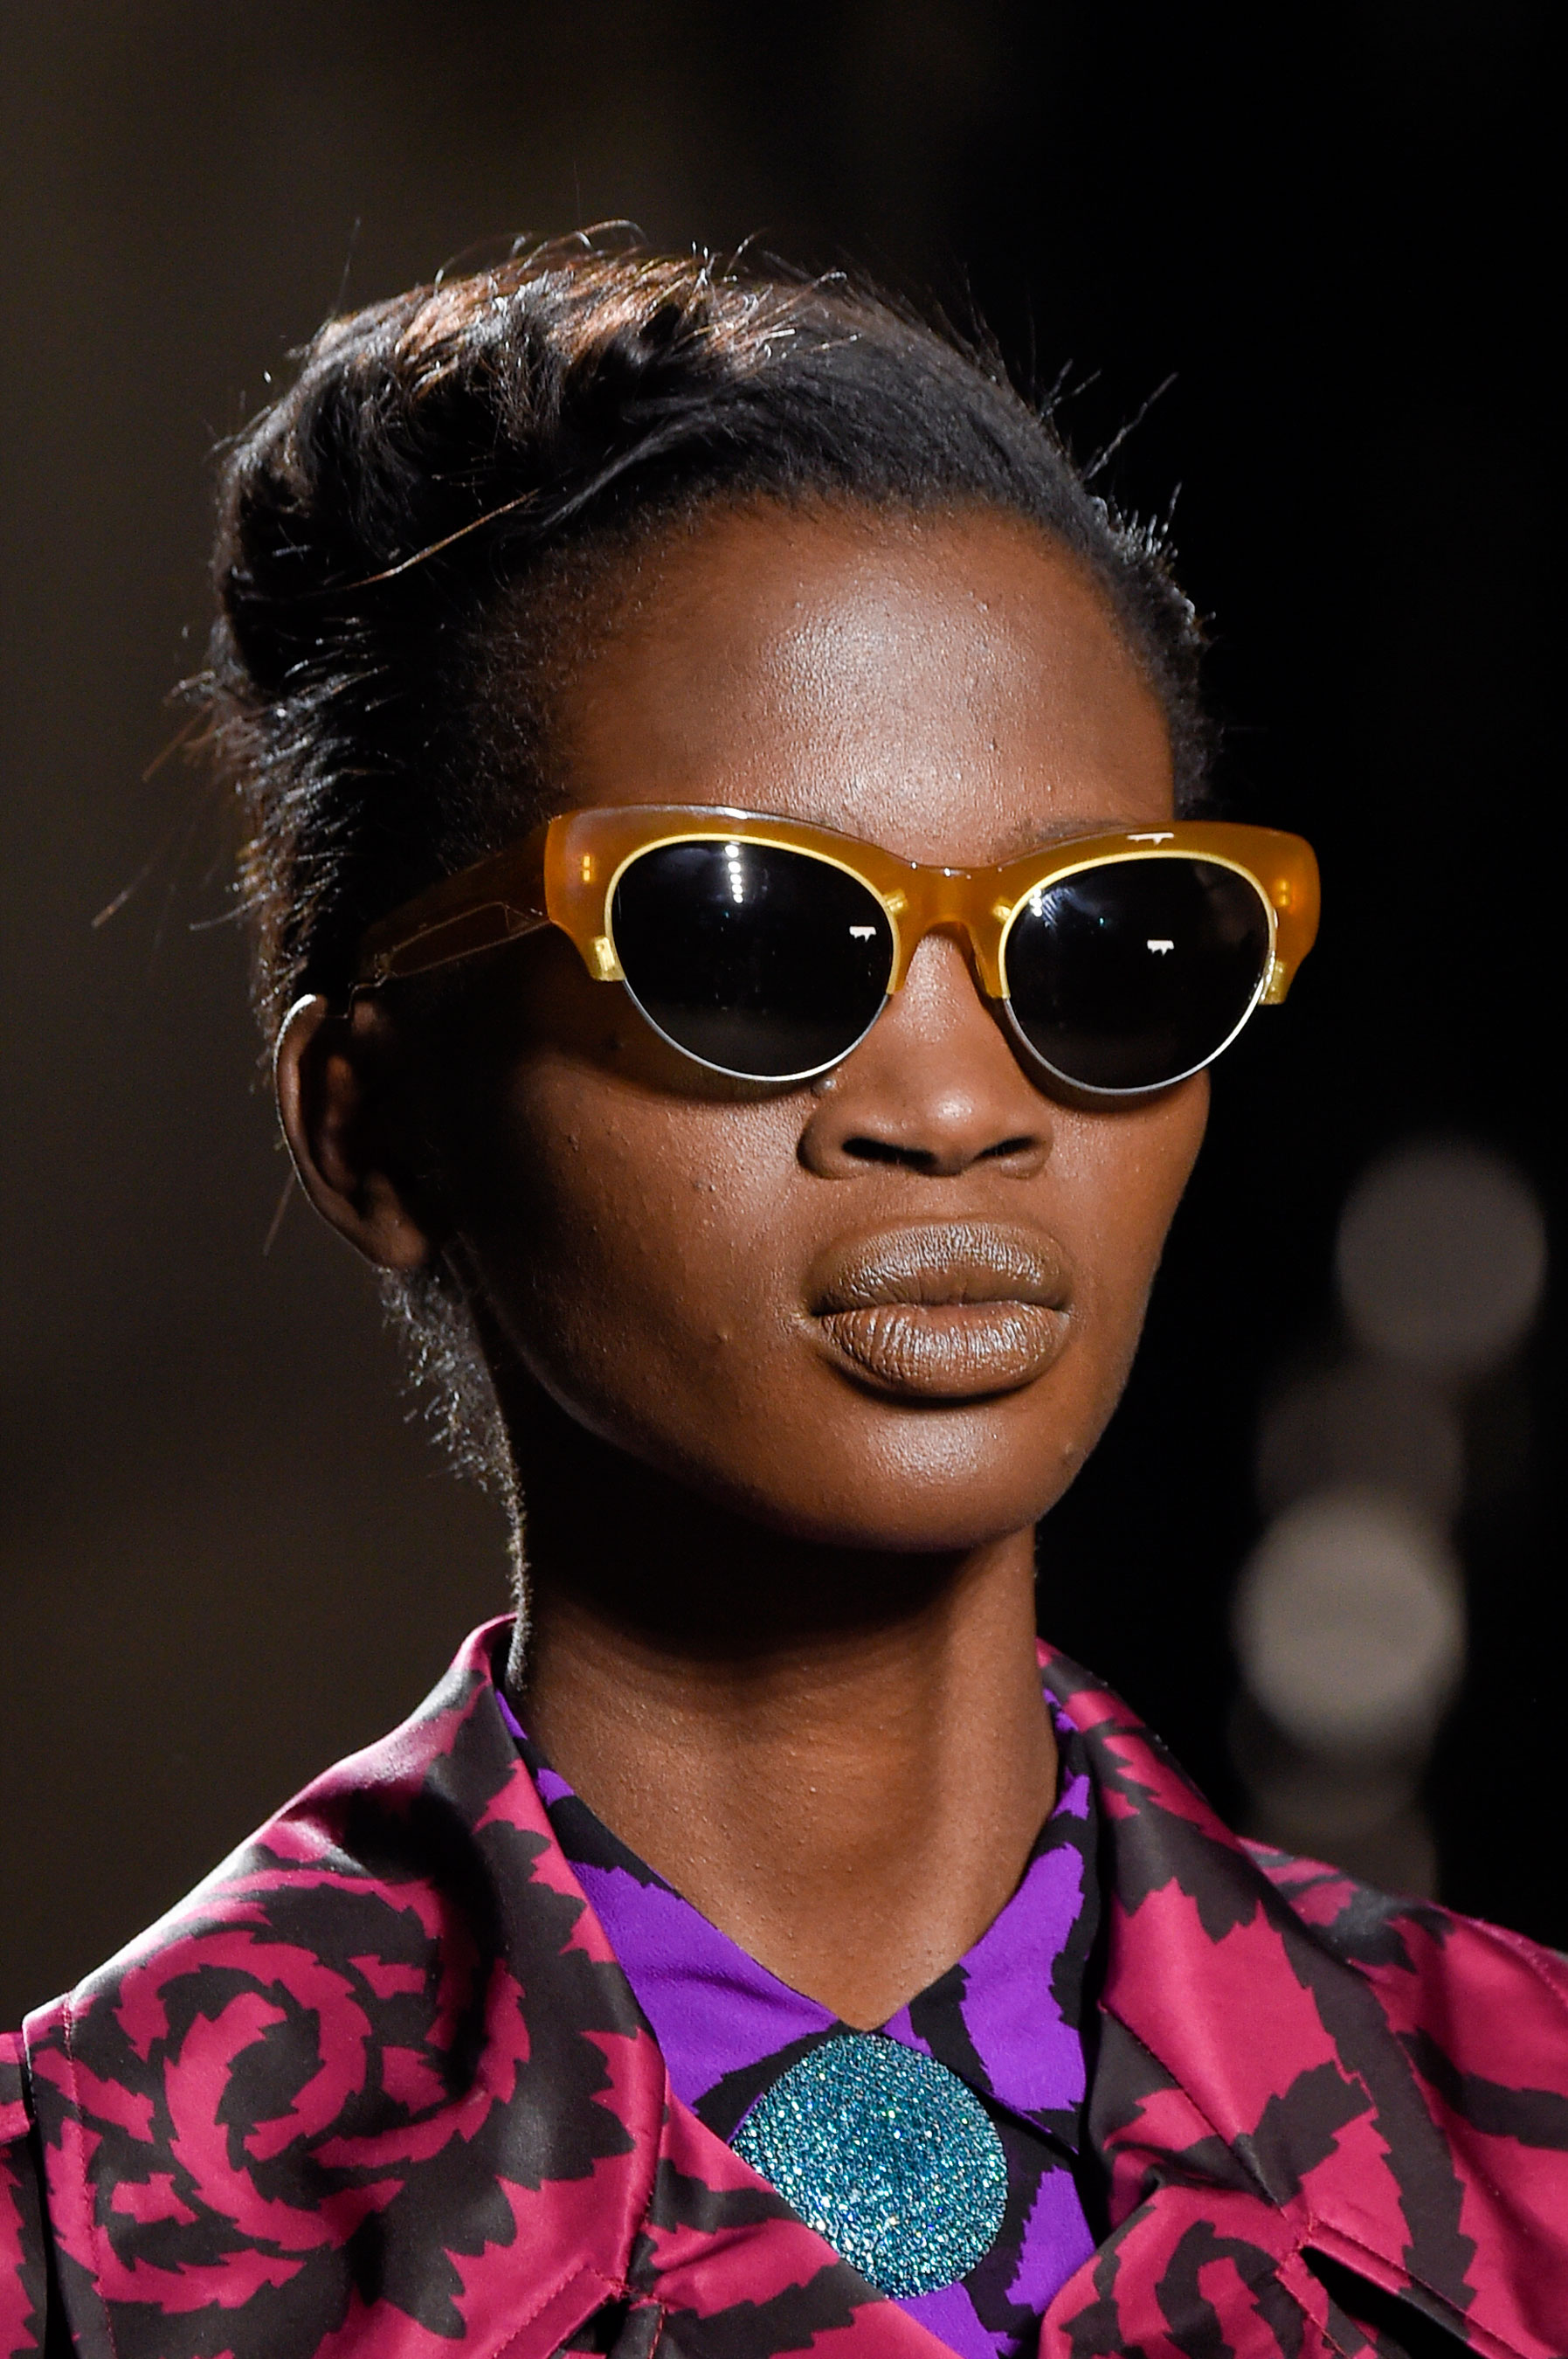 Dries-van-Noten-spring-2016-runway-beauty-fashion-show-the-impression-25